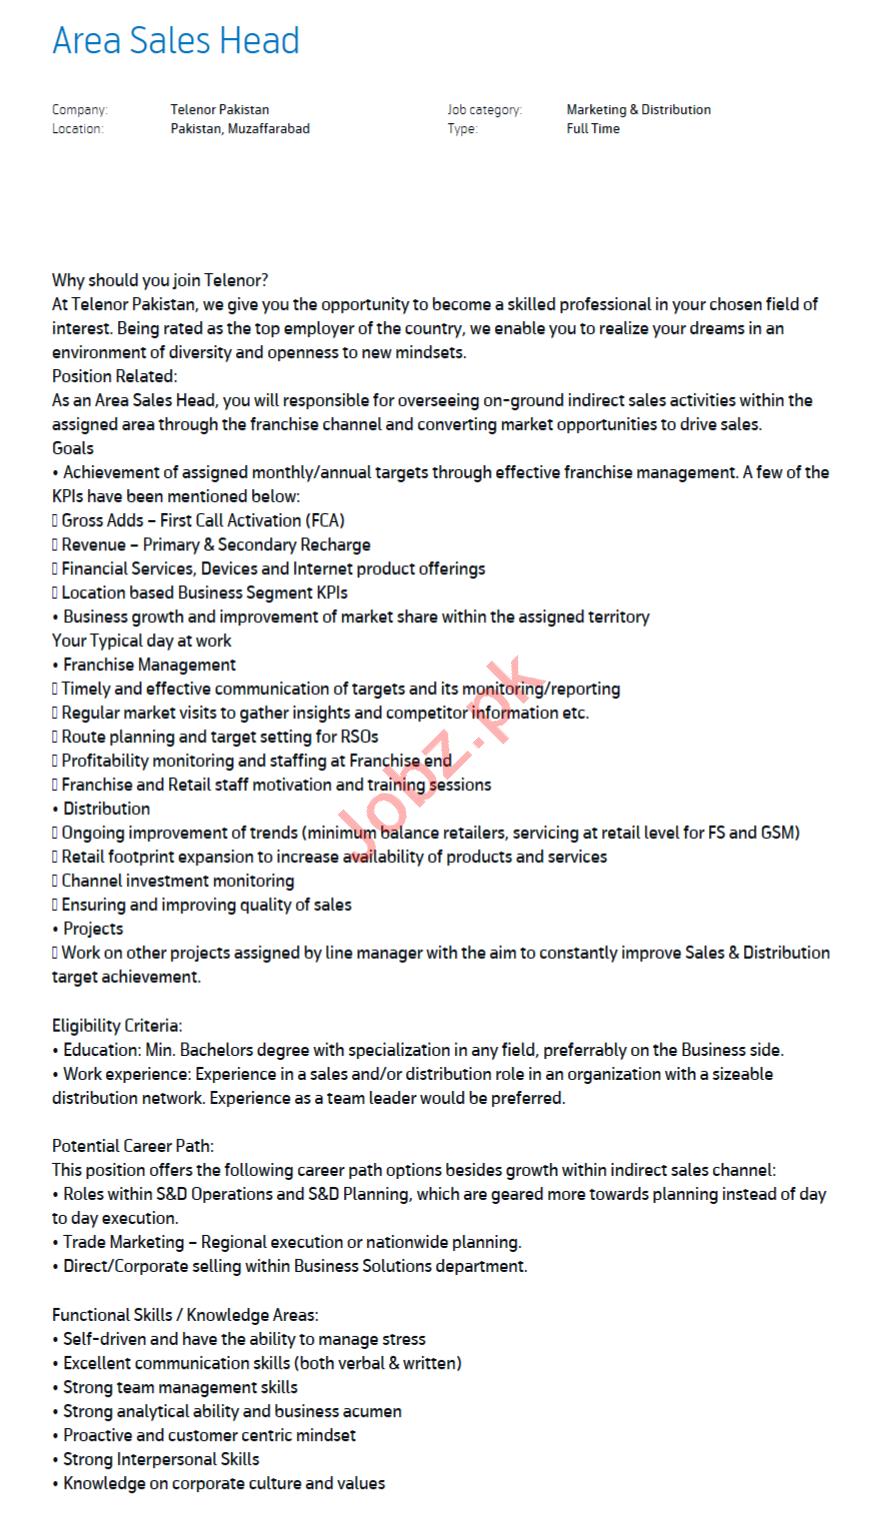 Area Sales Head Jobs 2021 in Telenor Muzaffarabad